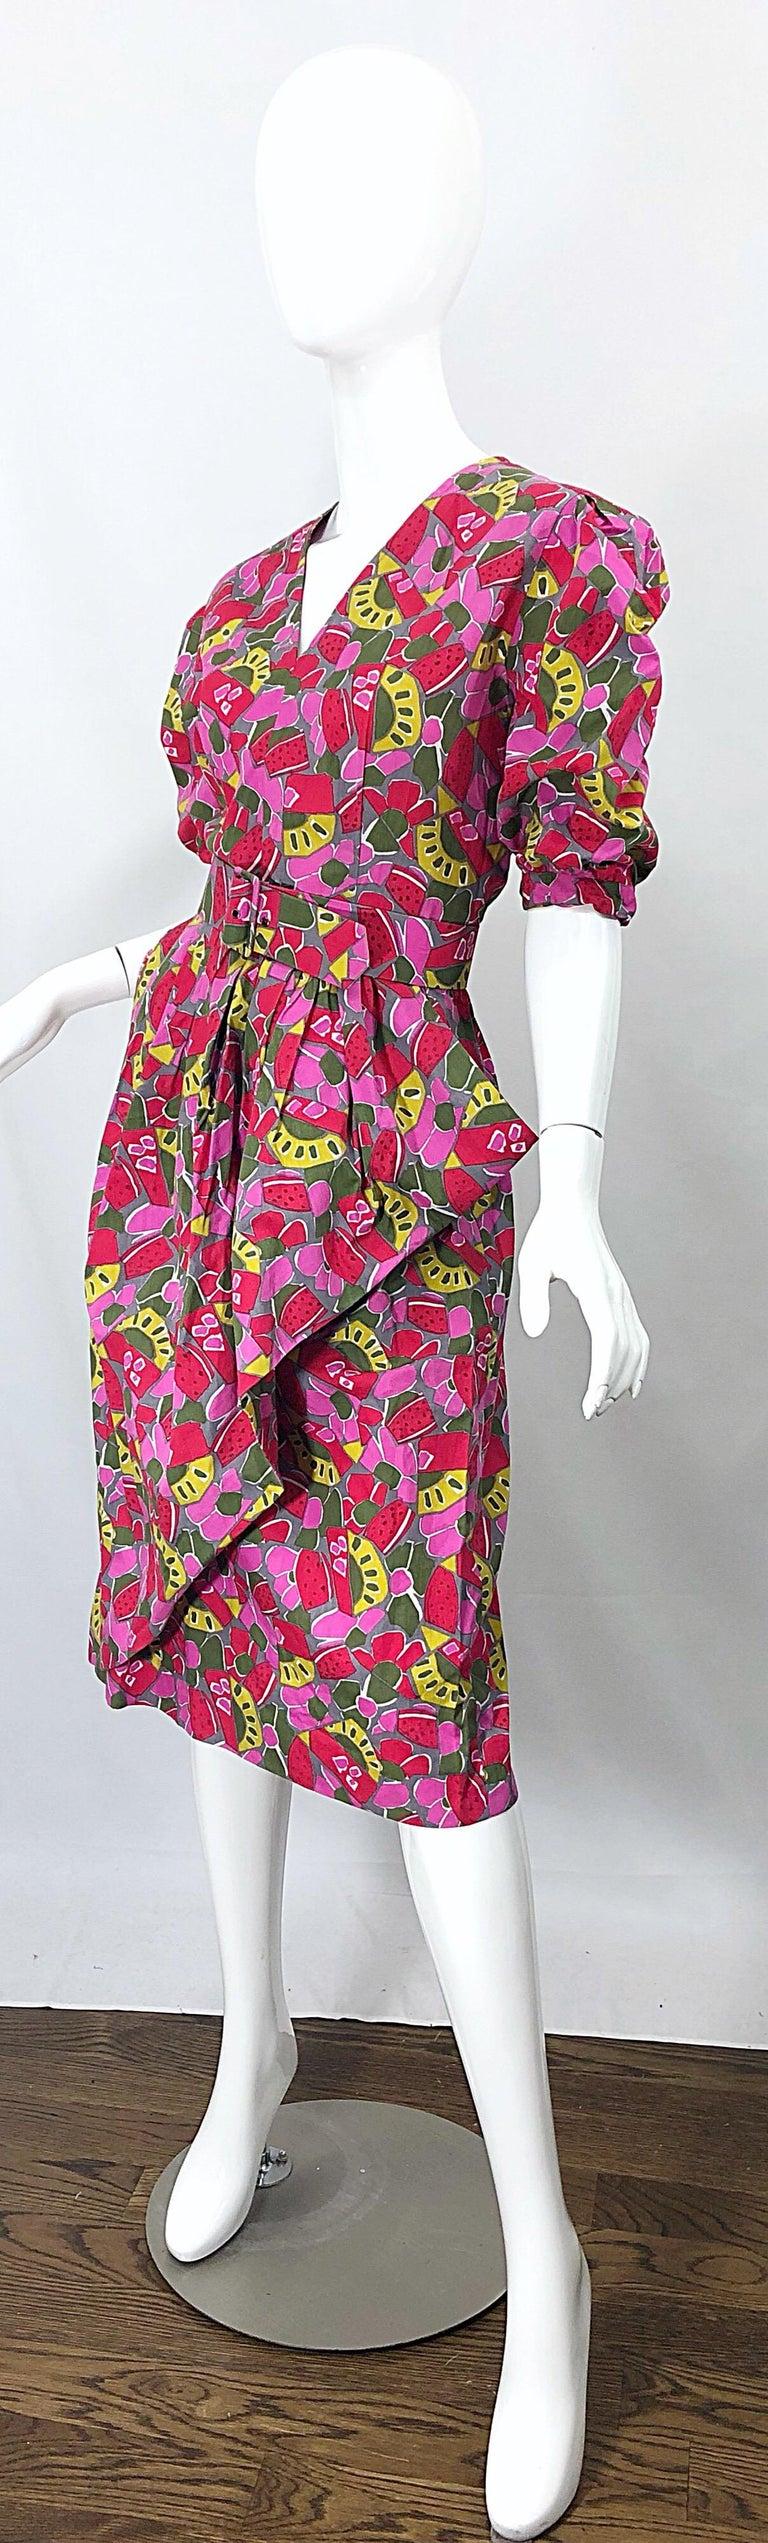 Women's 1980s Guy Laroche Size 44 / 12 Novelty Fruit Print Avant Garde Vintage 80s Dress For Sale